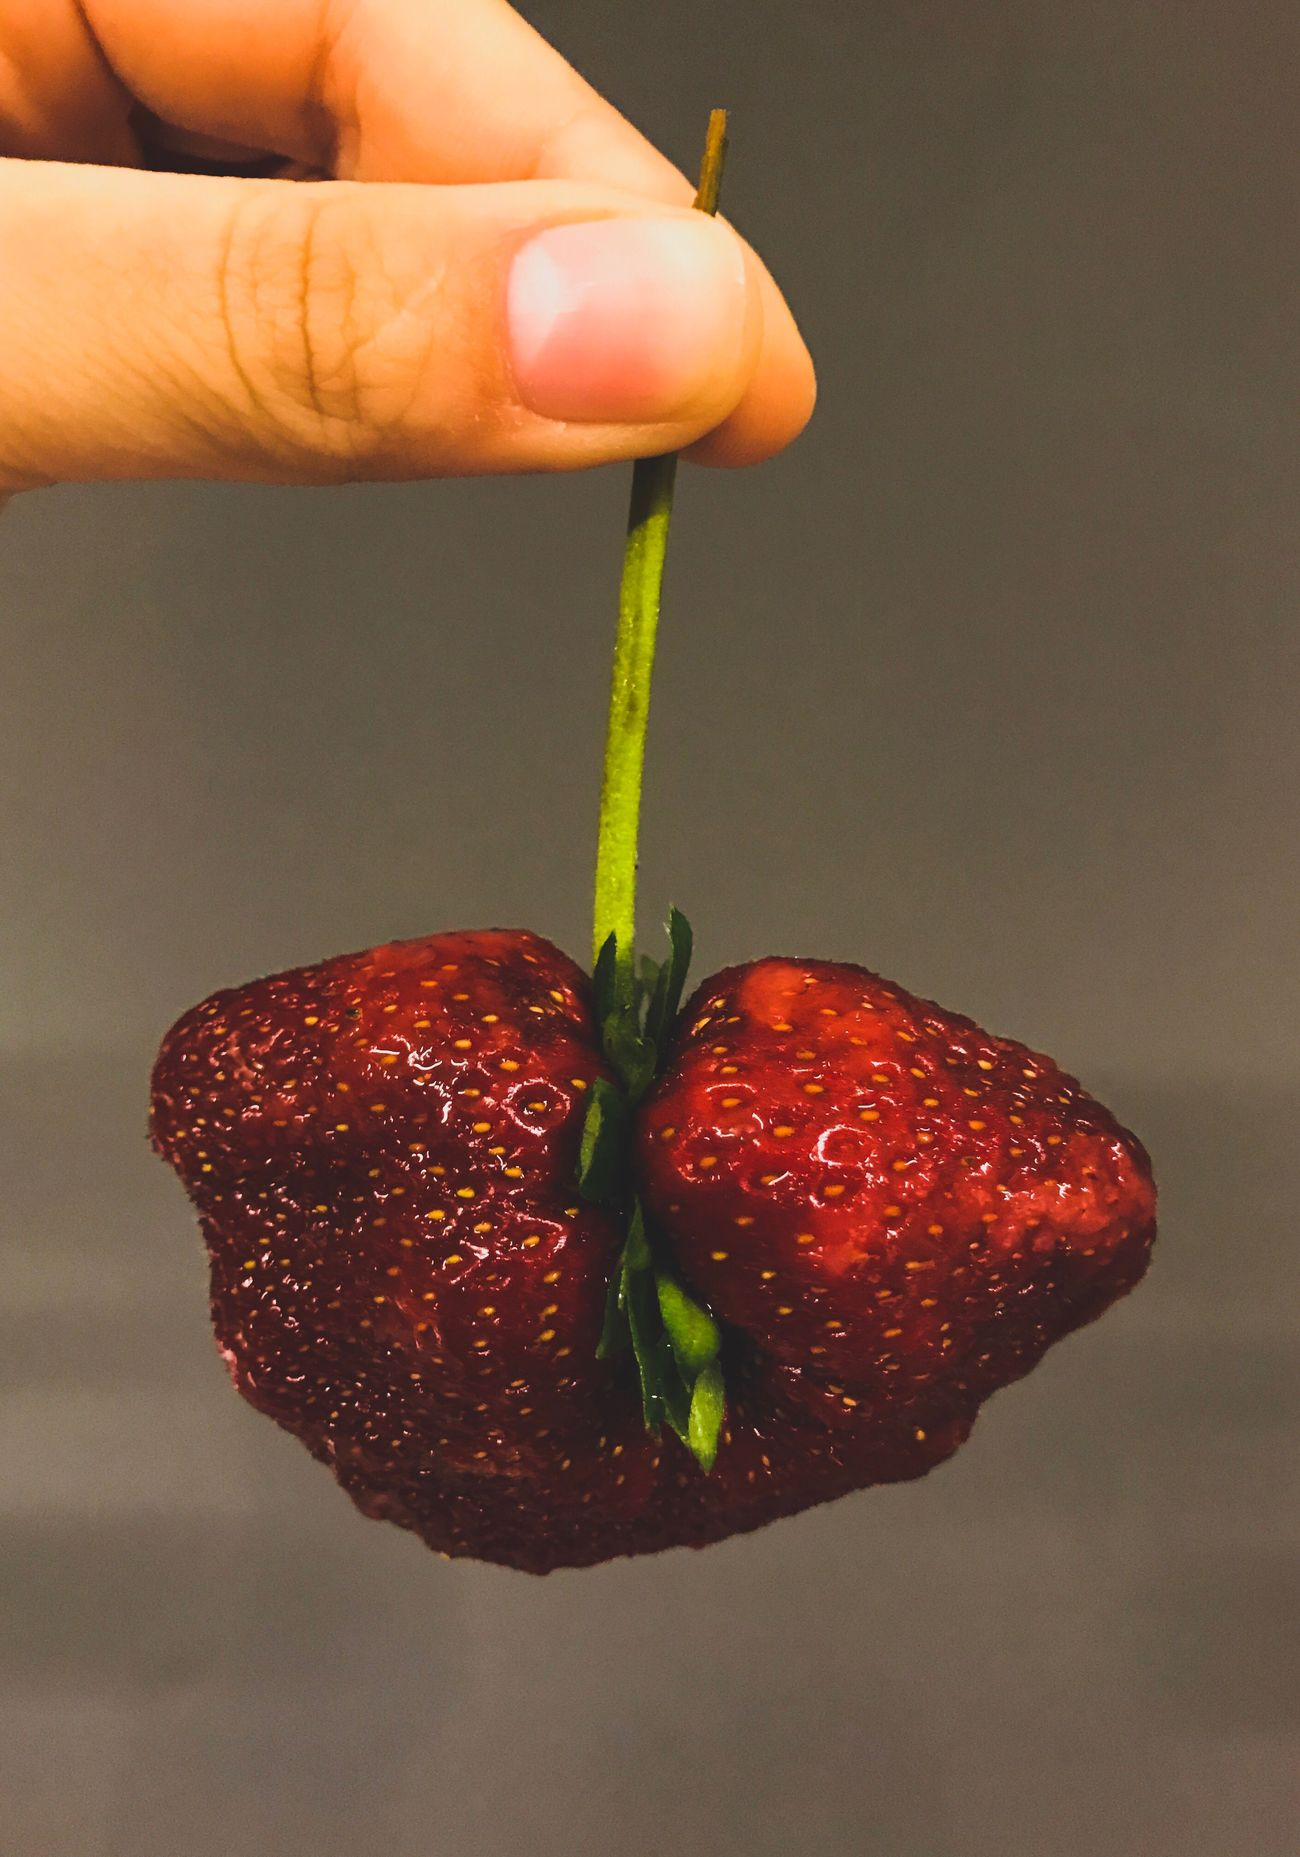 Strawberry Hormone Food Unrecognizable Nurs Fruit Human Hand Yummy